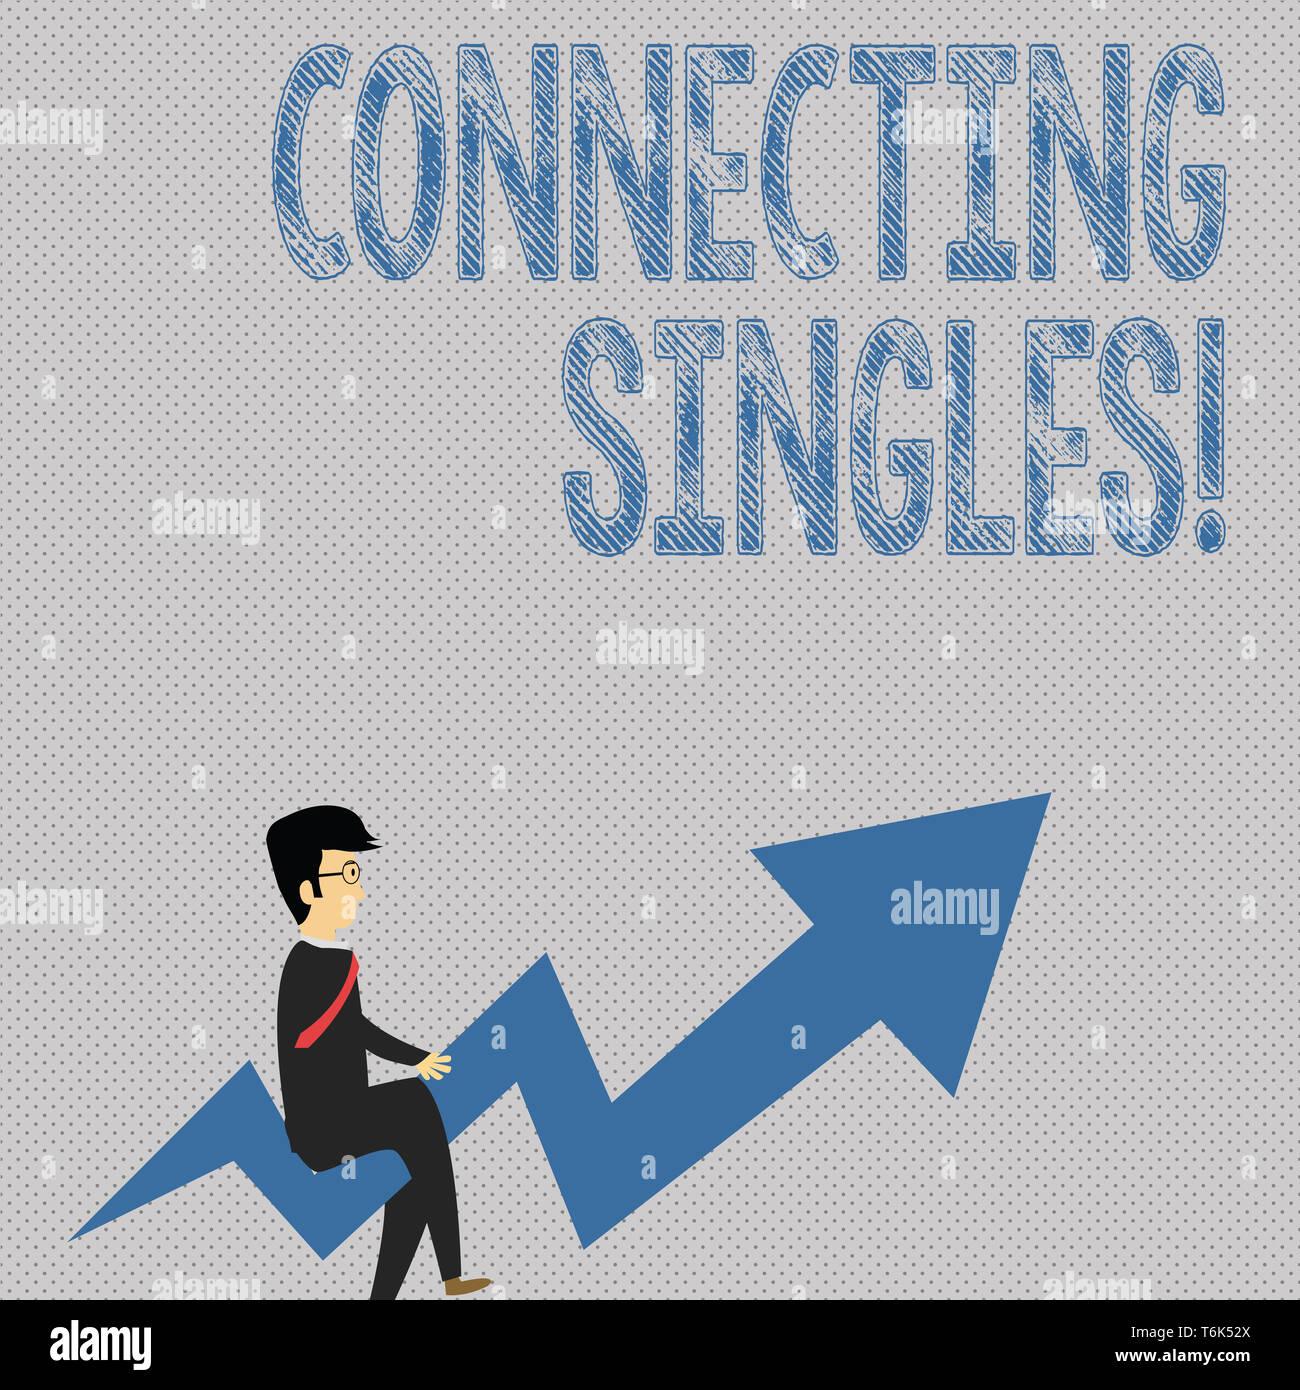 Asian Dating & Singles at rapidpressrelease.com™